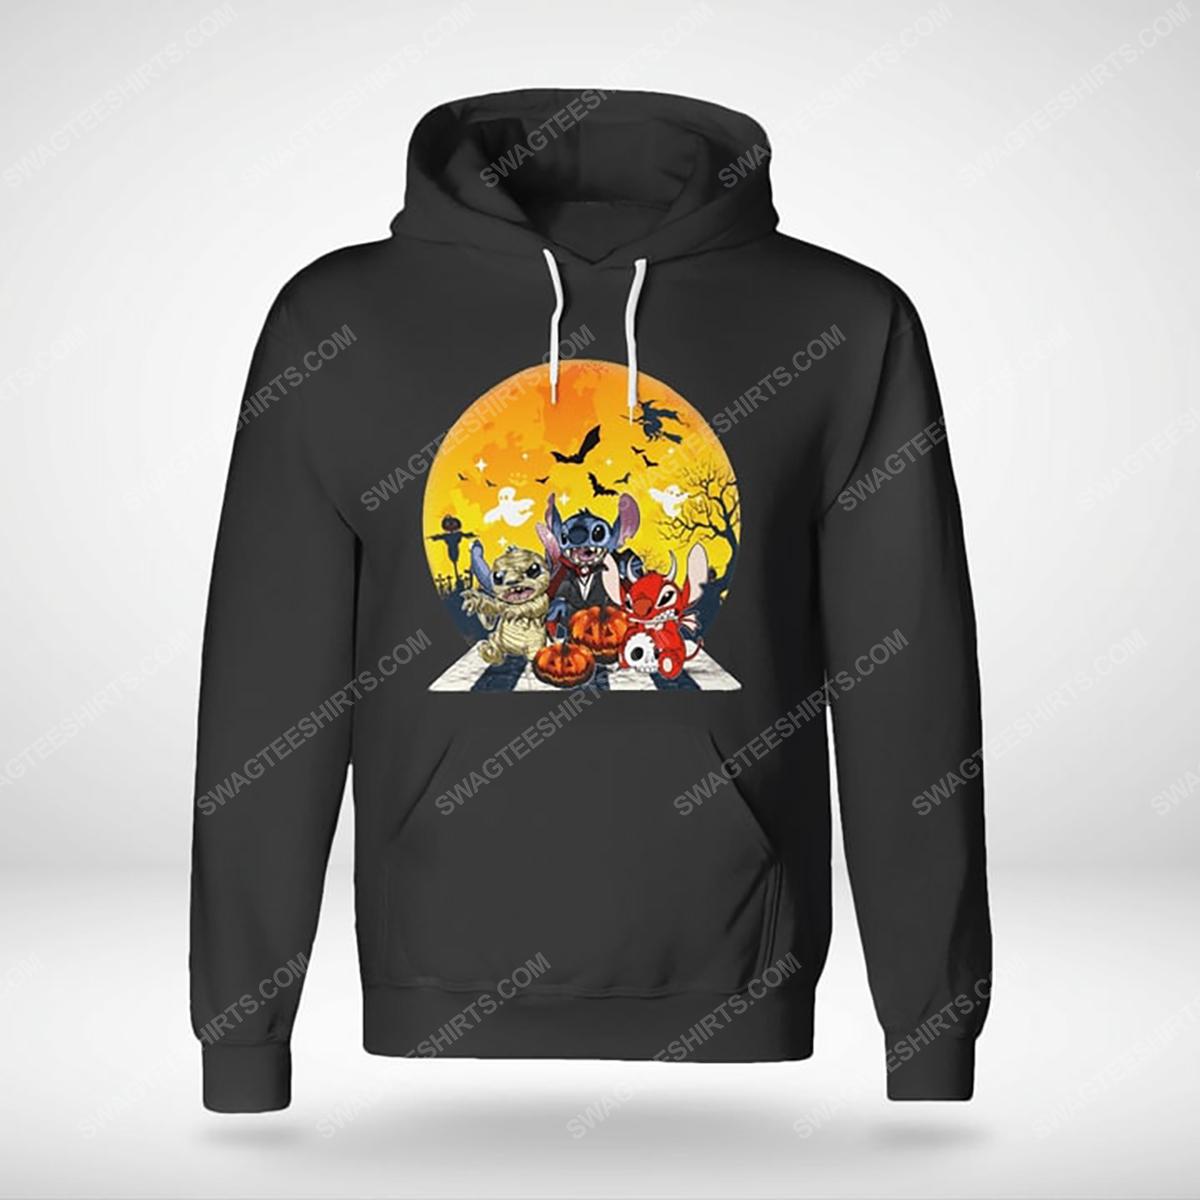 Halloween night stitch cosplay horror characters hoodie(1)